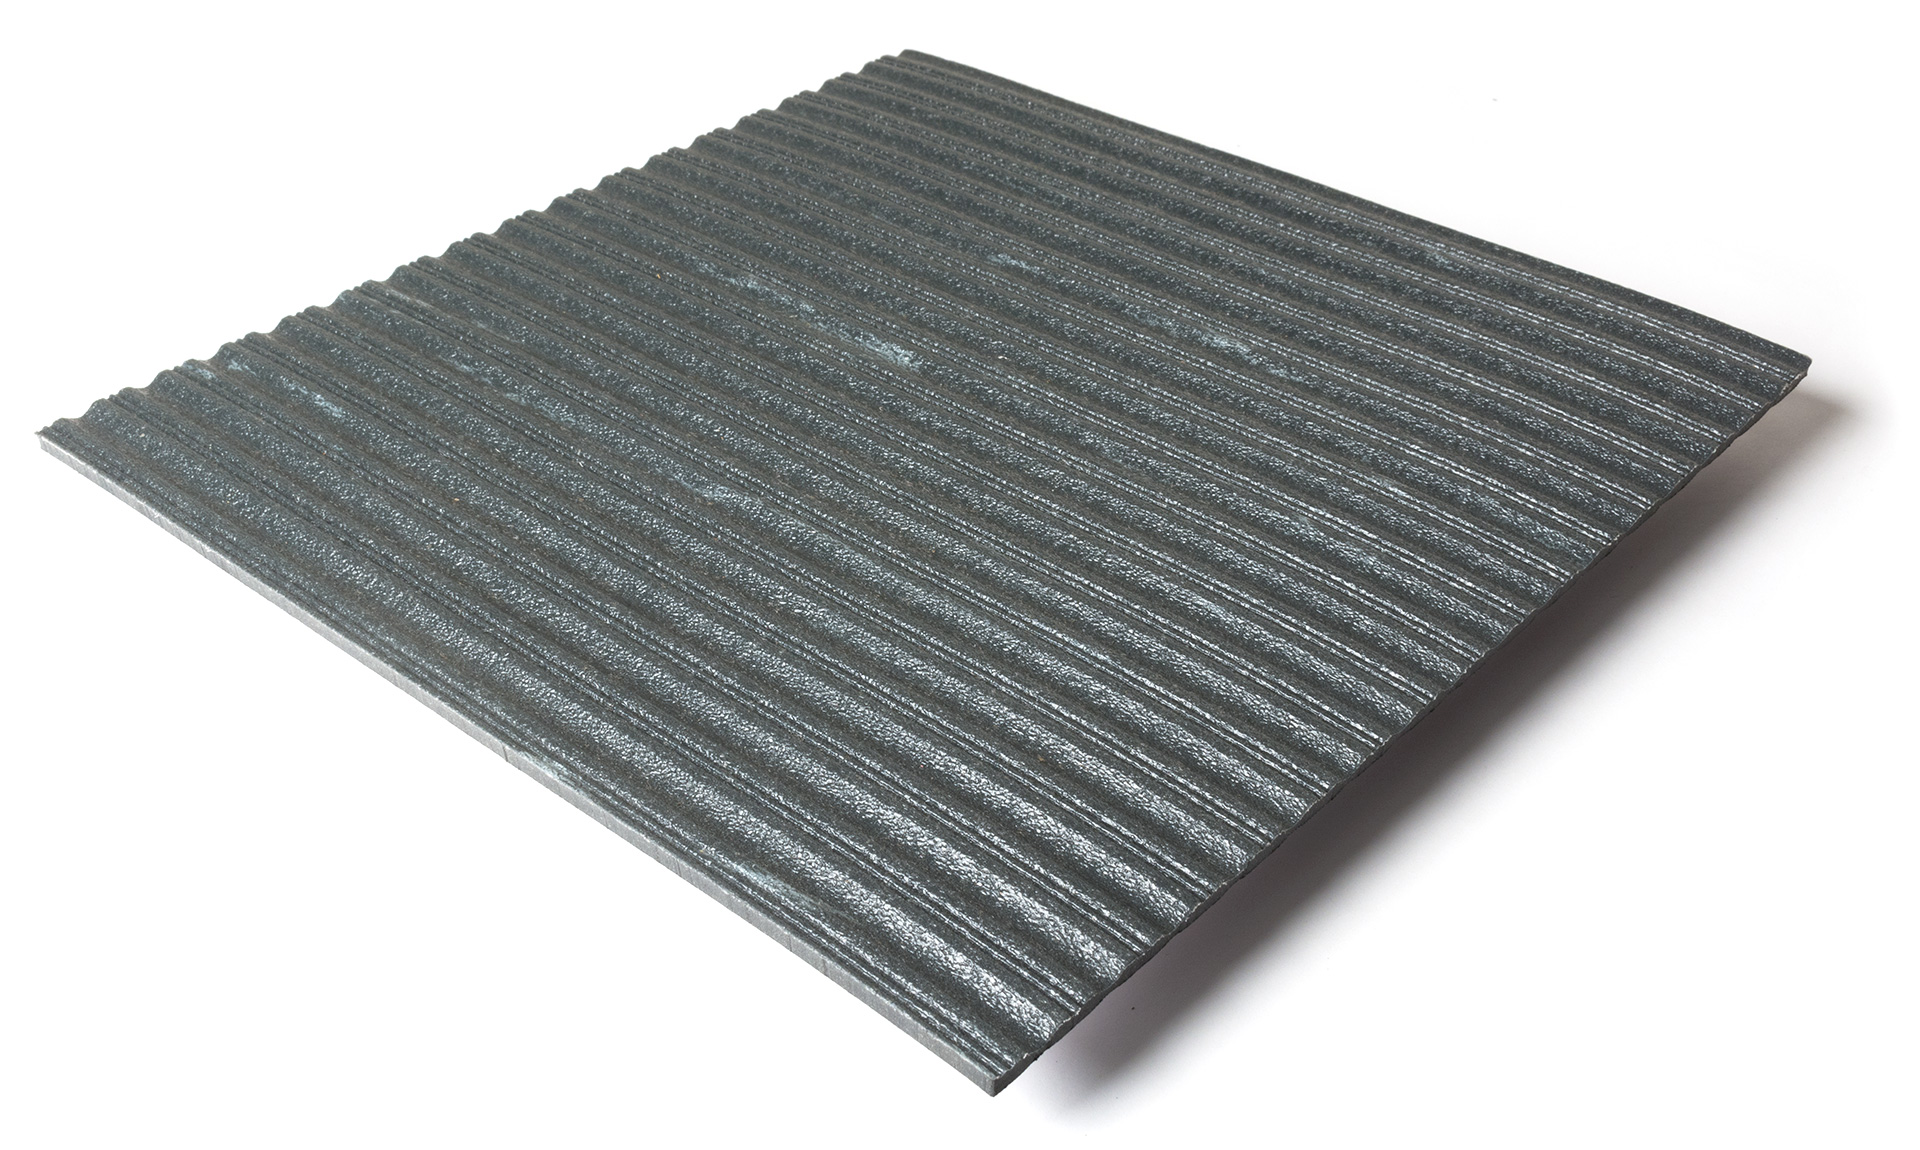 Standard transit flooring in DS marbled dark gray, ribbed